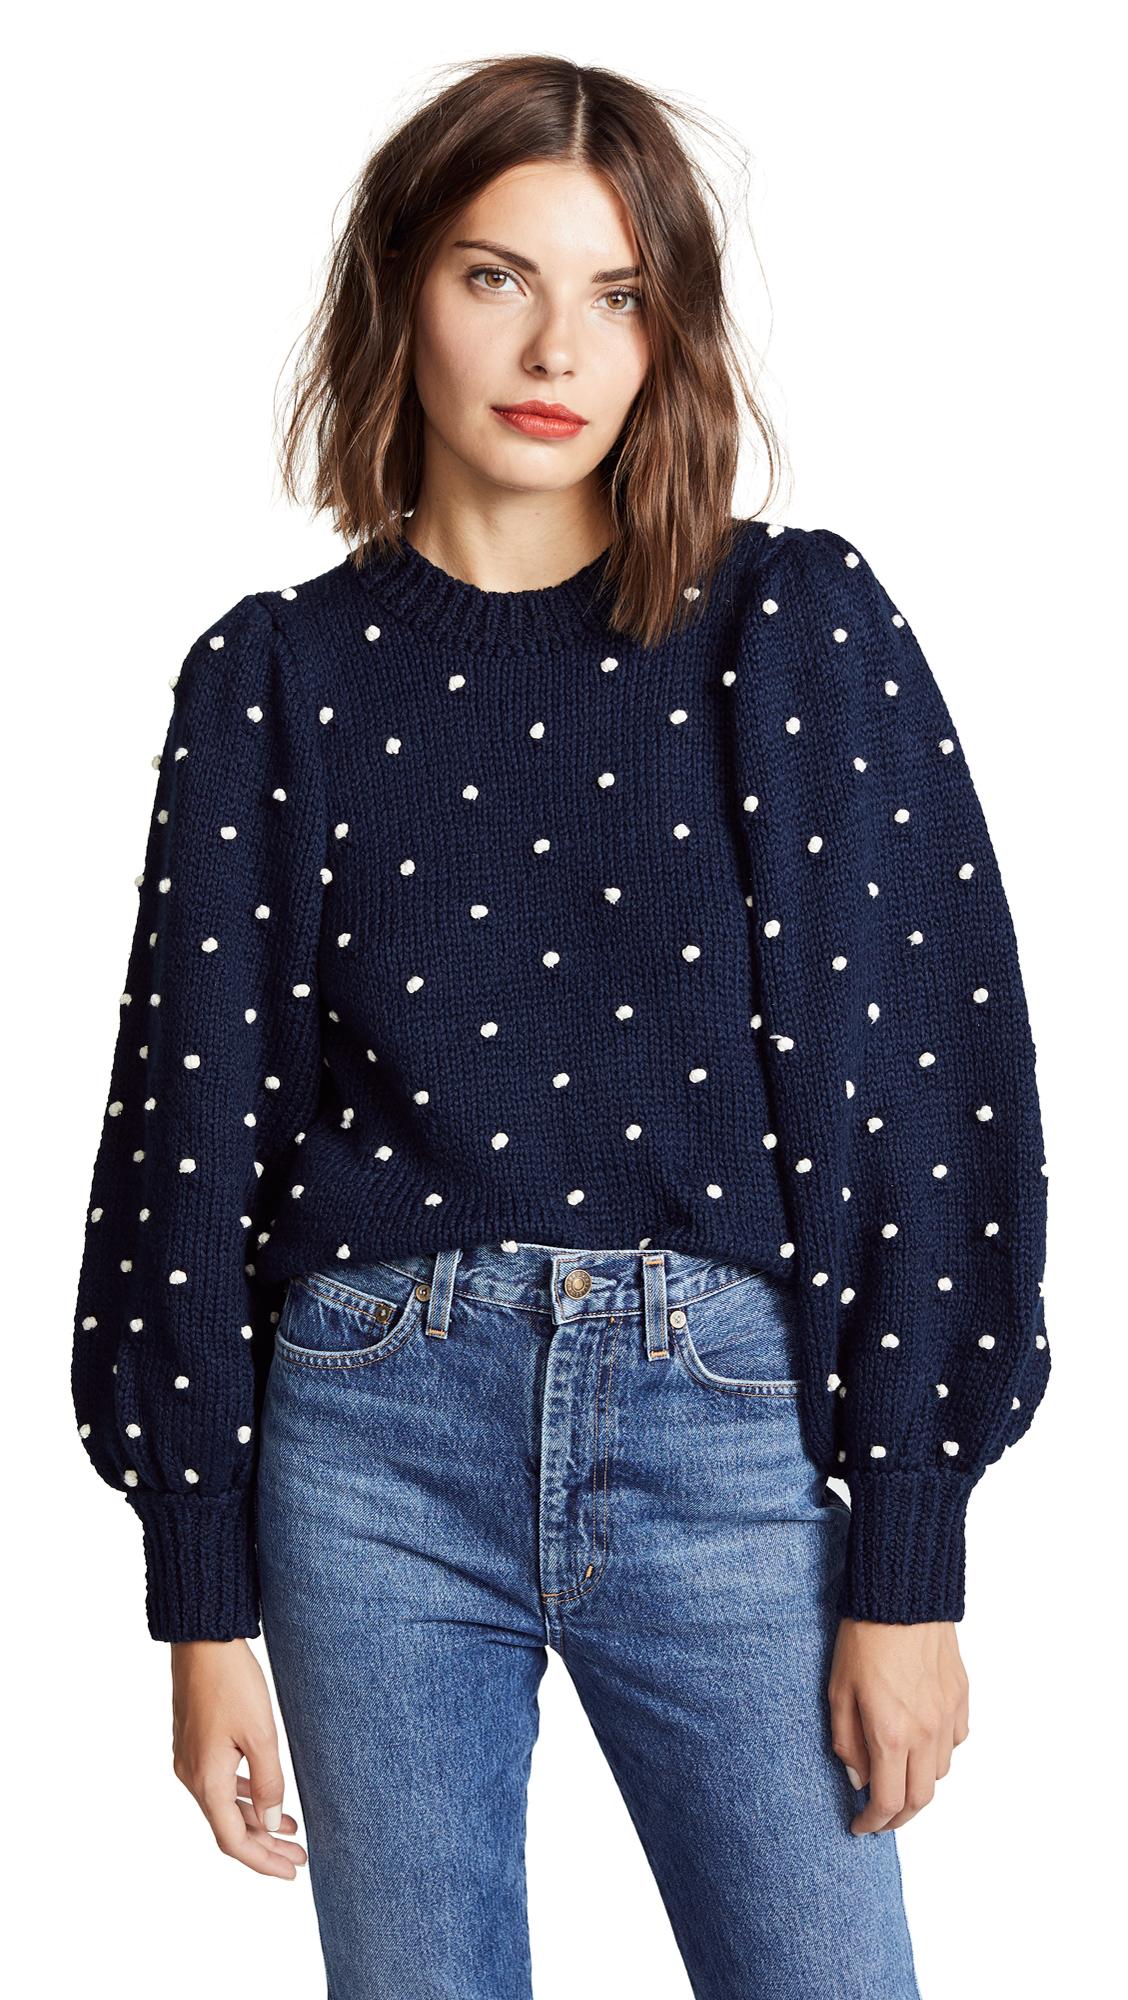 ULLA JOHNSON Adelen Polka Dot Cotton Sweater - Navy Size M in Blue